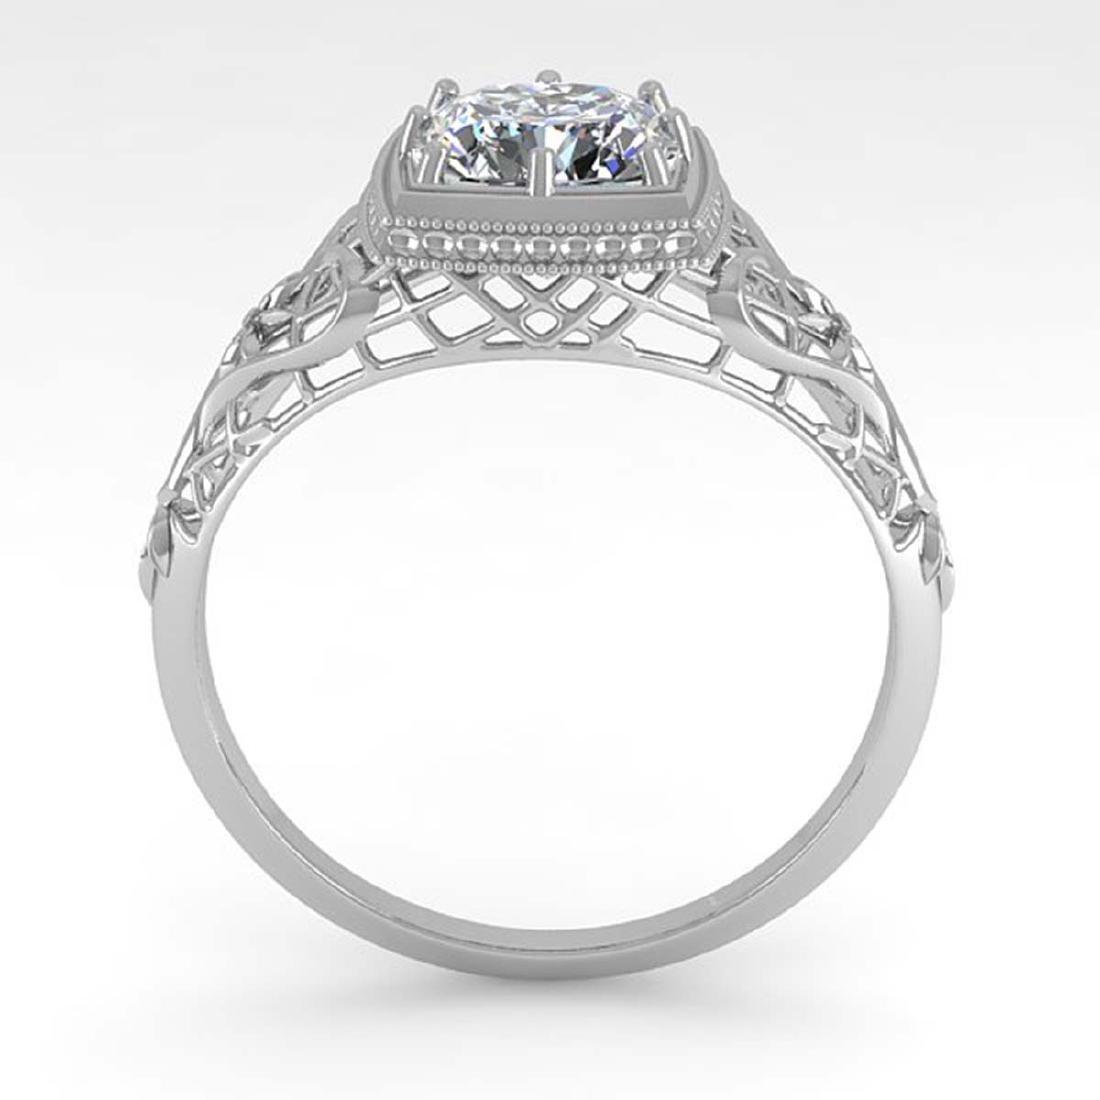 1.0 CTW Certified VS/SI Cushion Diamond Ring Art Deco - 3